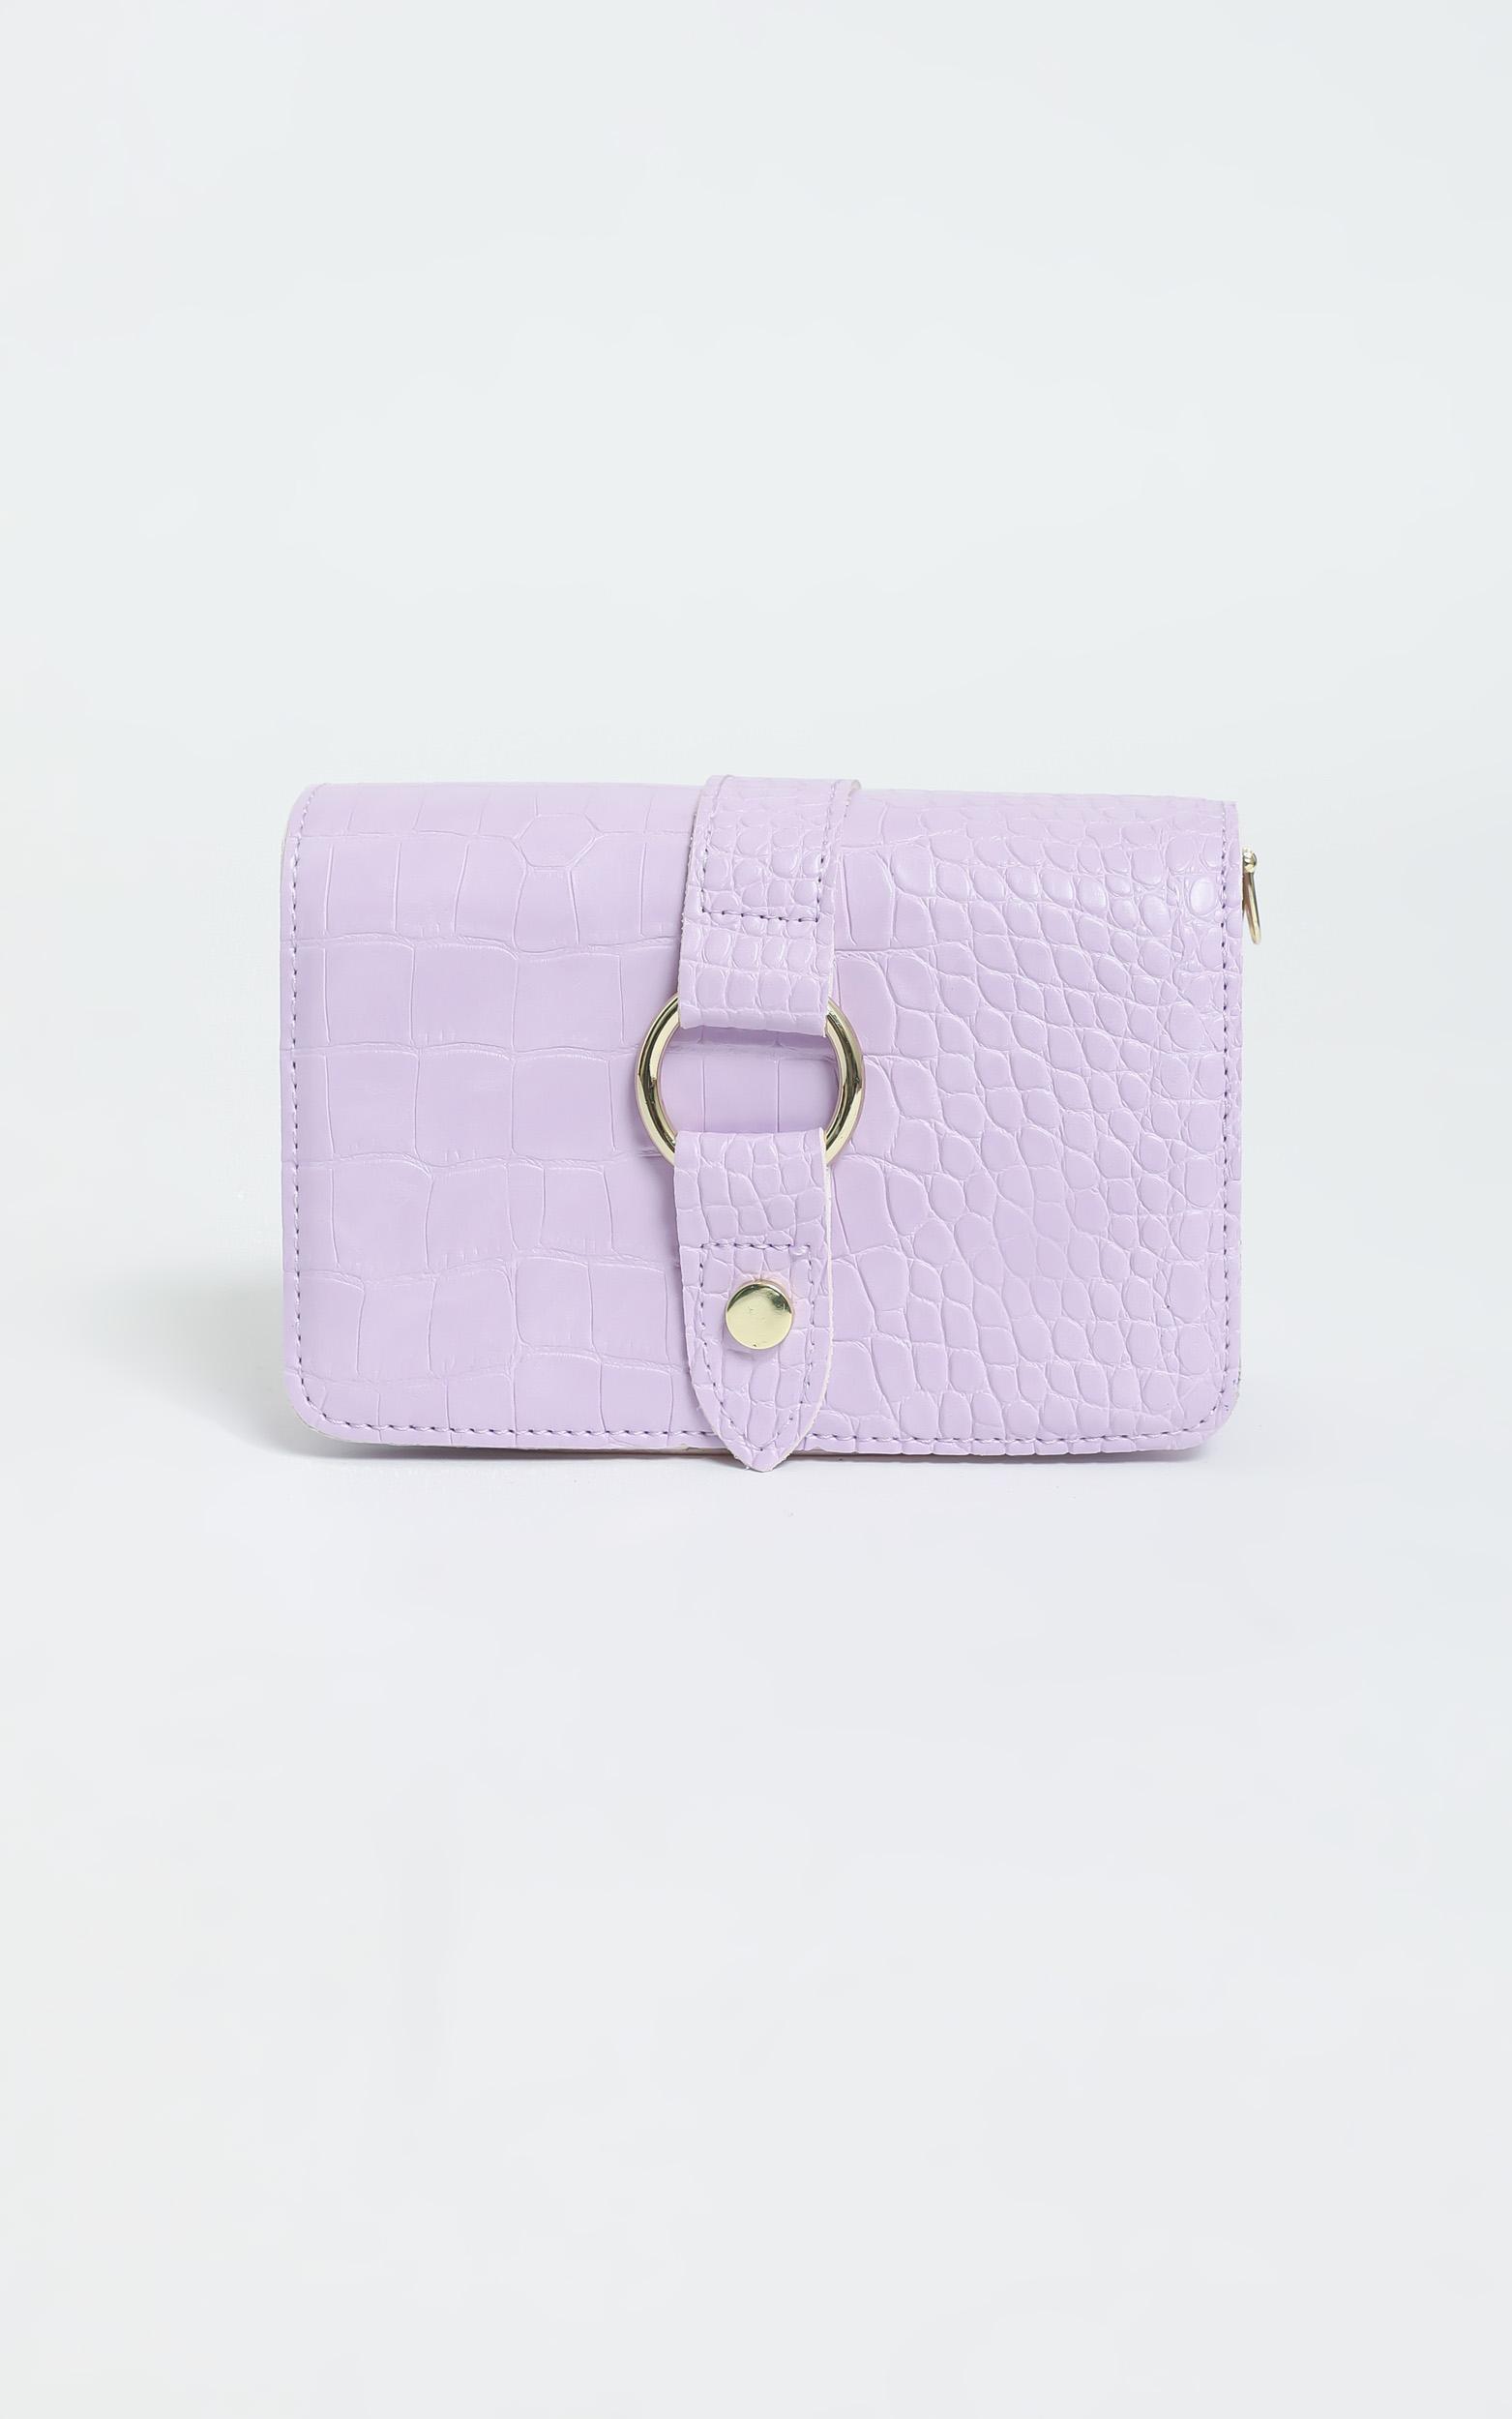 Braelynn Bag in Lilac, , hi-res image number null